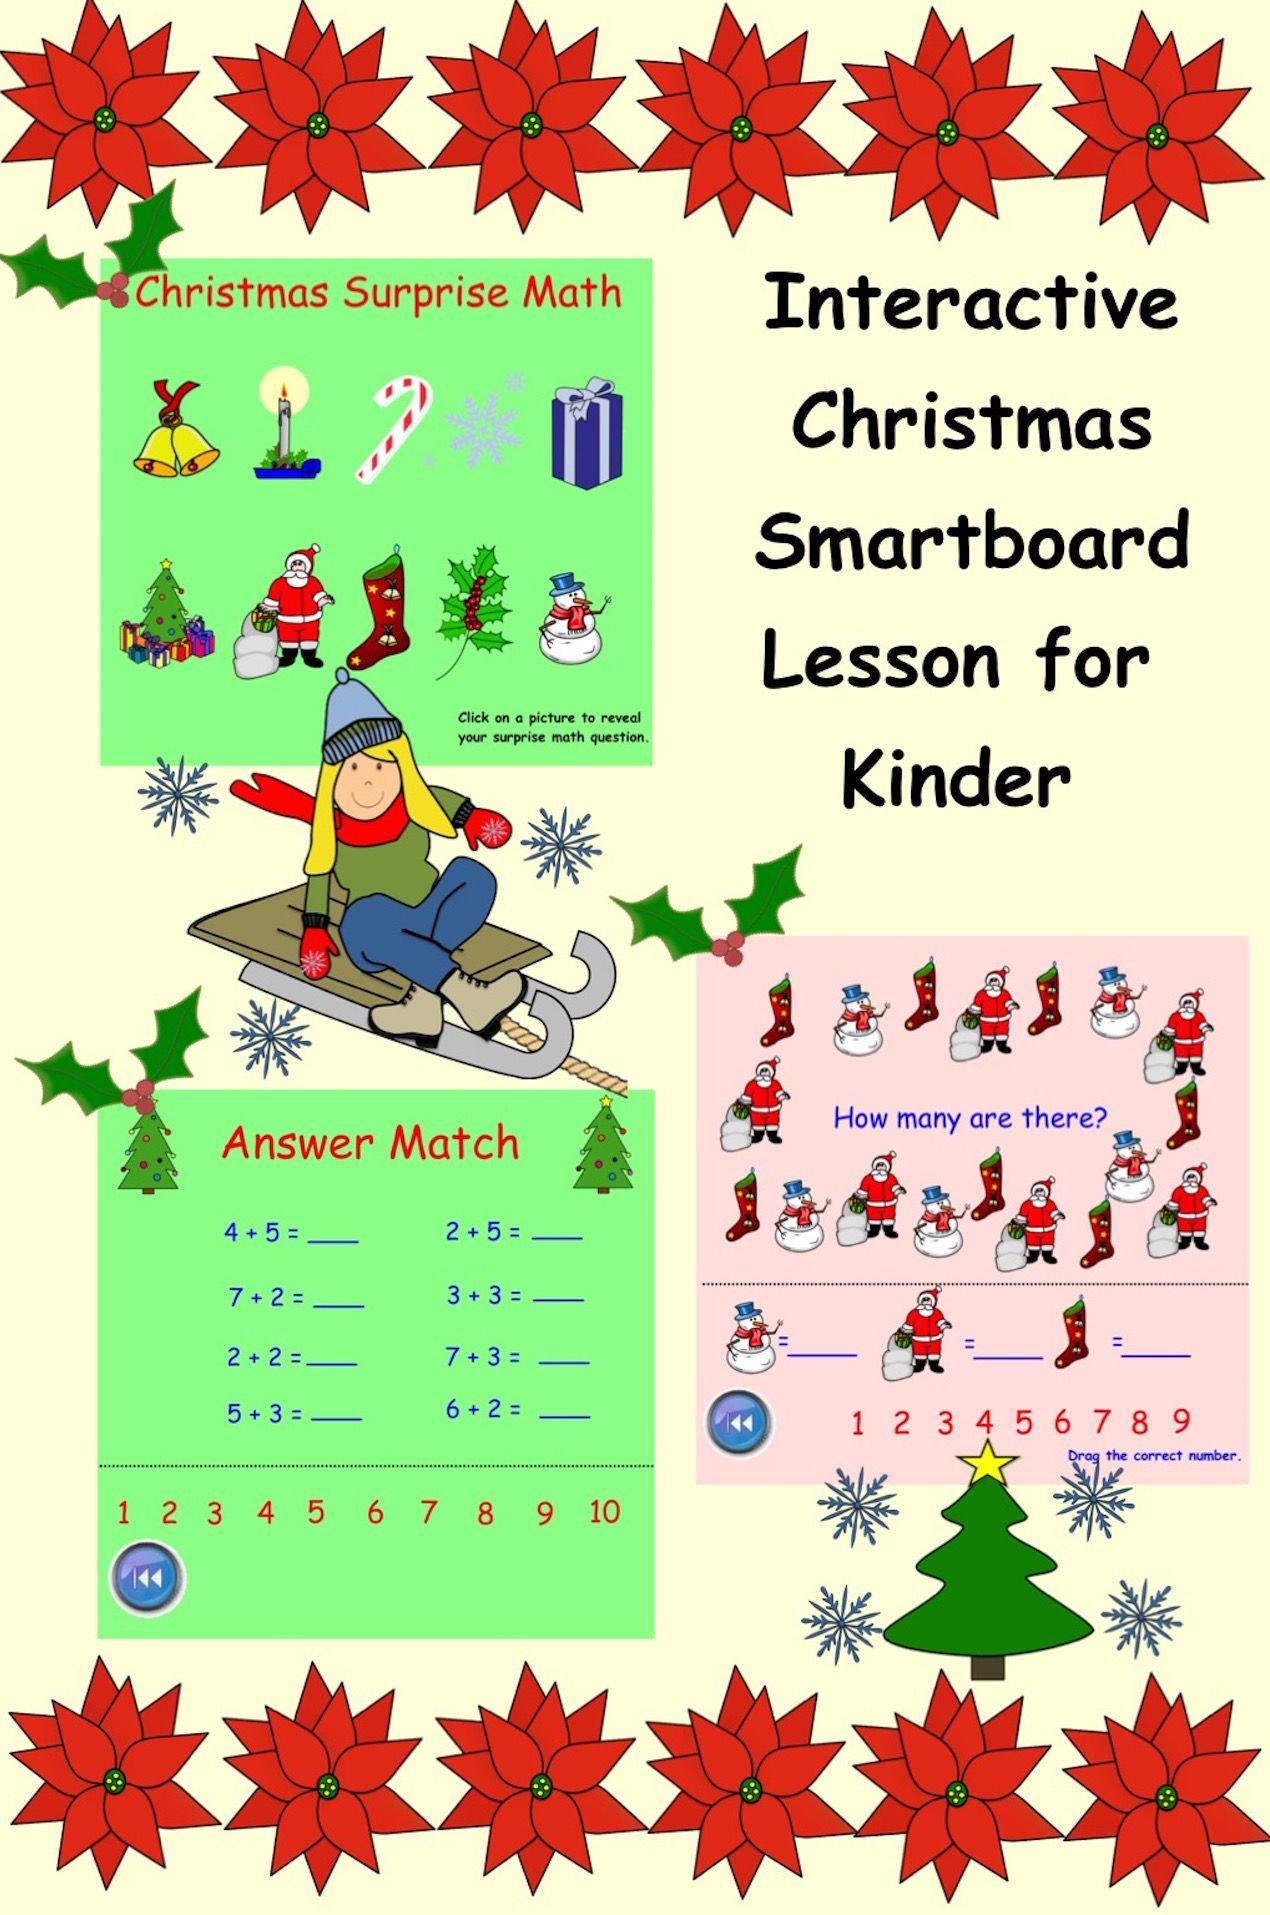 Smartboard Christmas Surprise Math